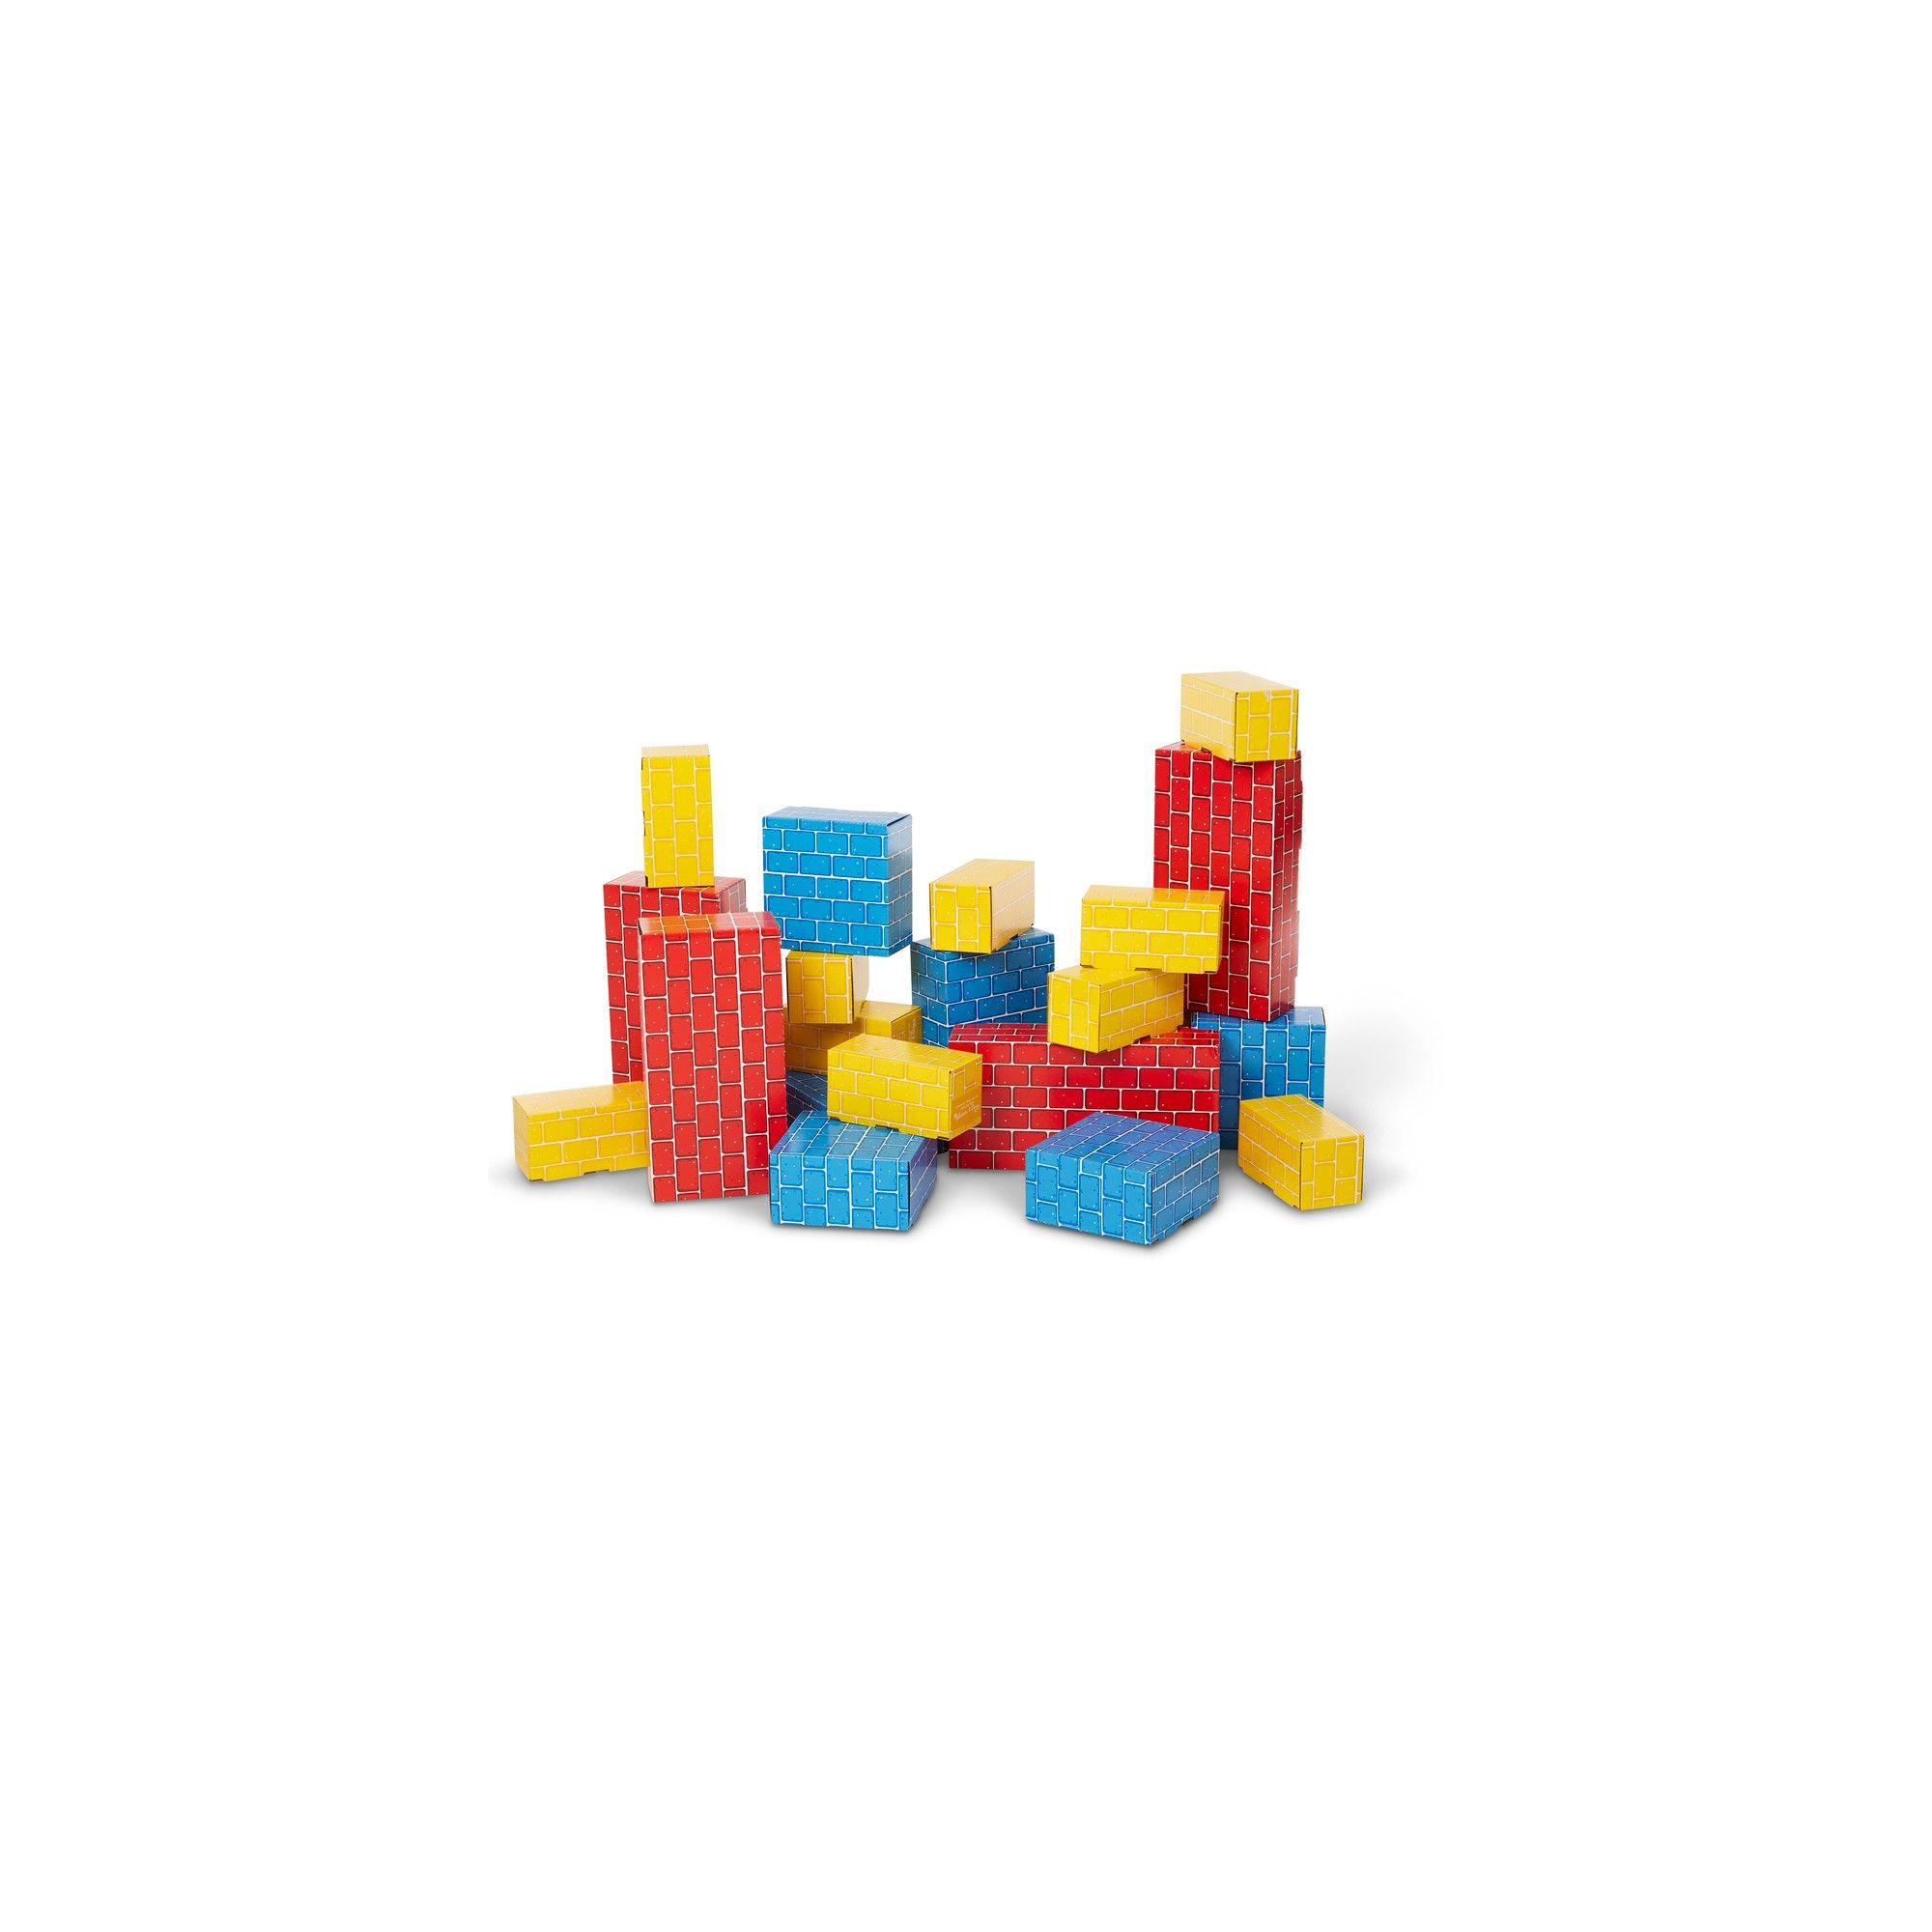 Melissa Doug Extra-Thick Cardboard Building Blocks 24 Blocks in 3 Sizes